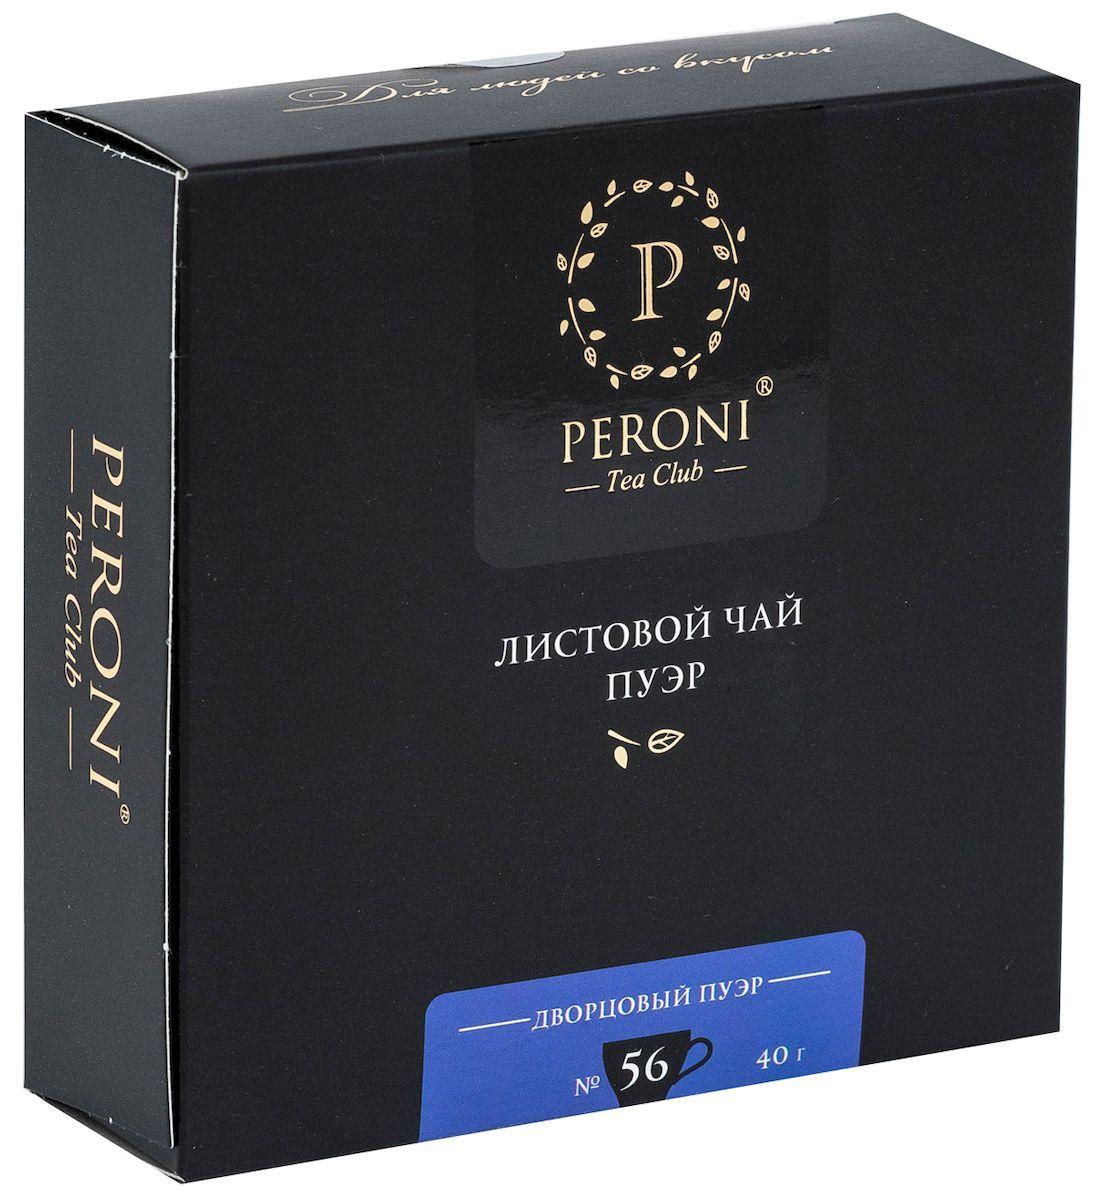 Peroni Чай Дворцовый пуэр, 40 г новогодний набор rose романтика и страсть макси peroni